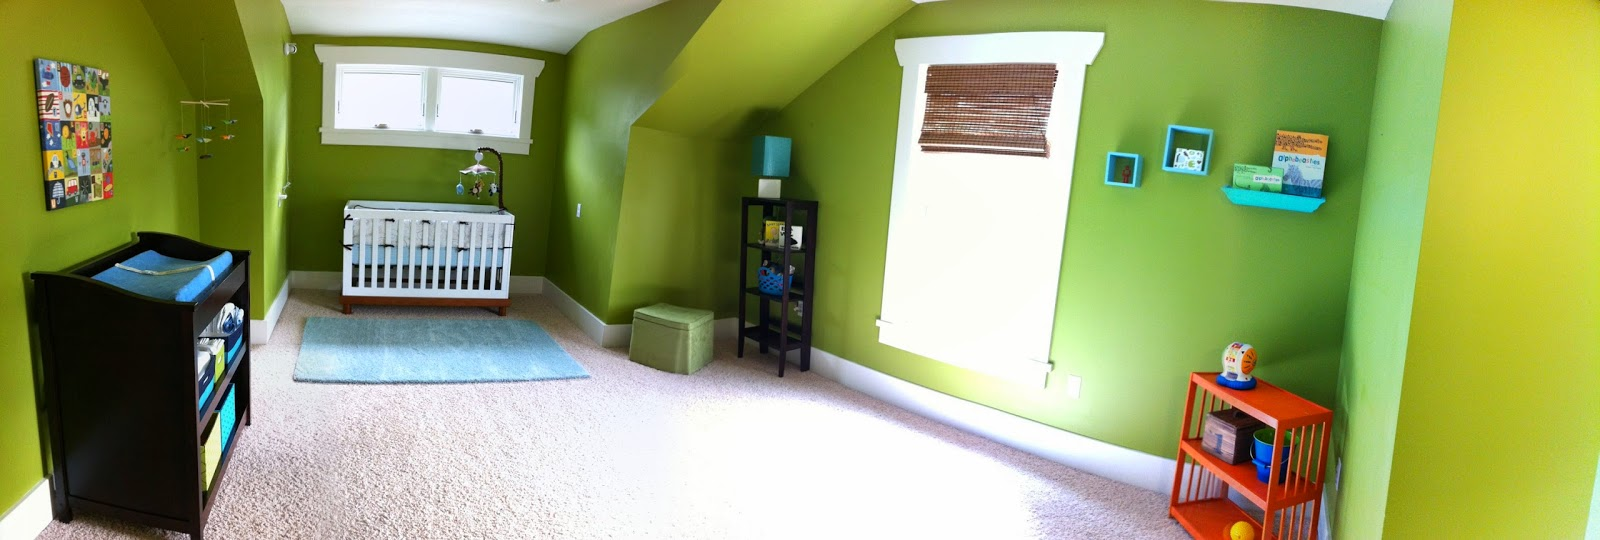 Sylvie's room when it was Carter's nursery.